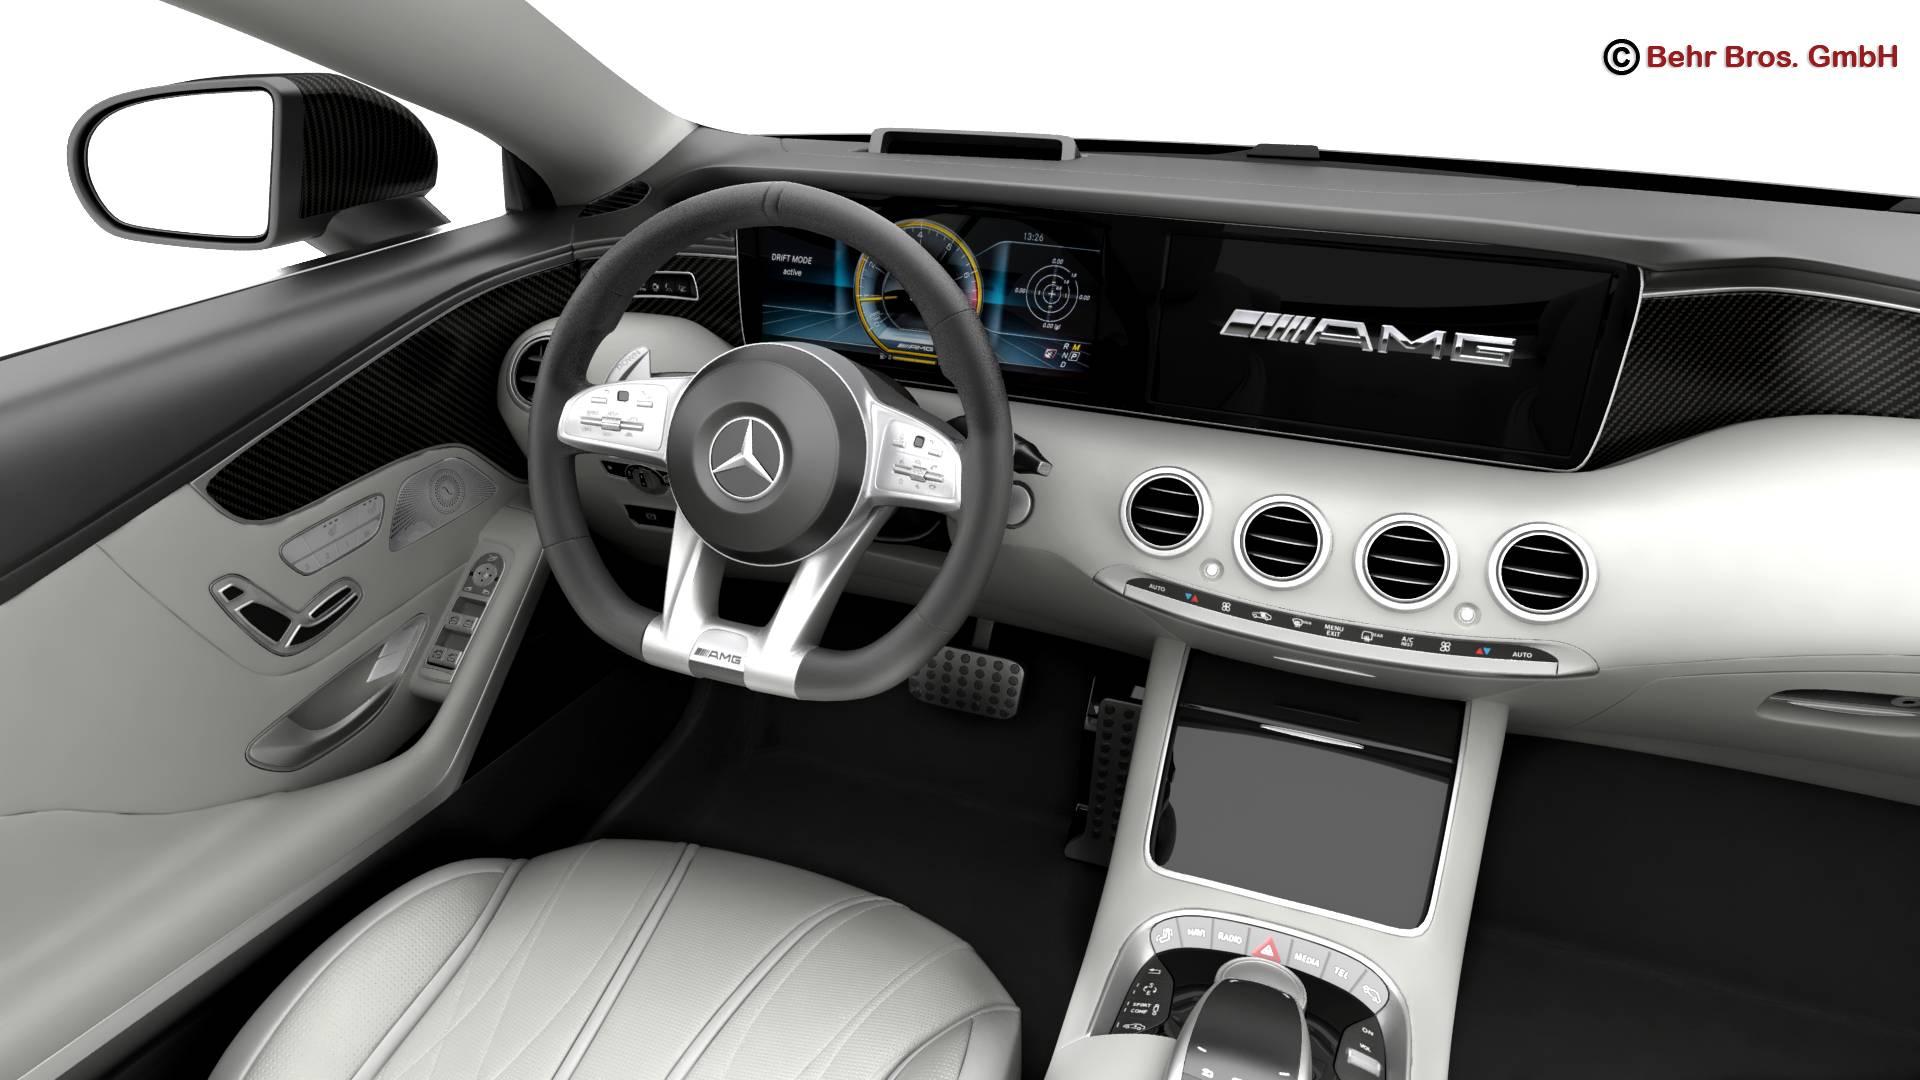 mercedes s class coupe amg s63 2018 3d model 3ds max fbx c4d lwo ma mb obj 274103